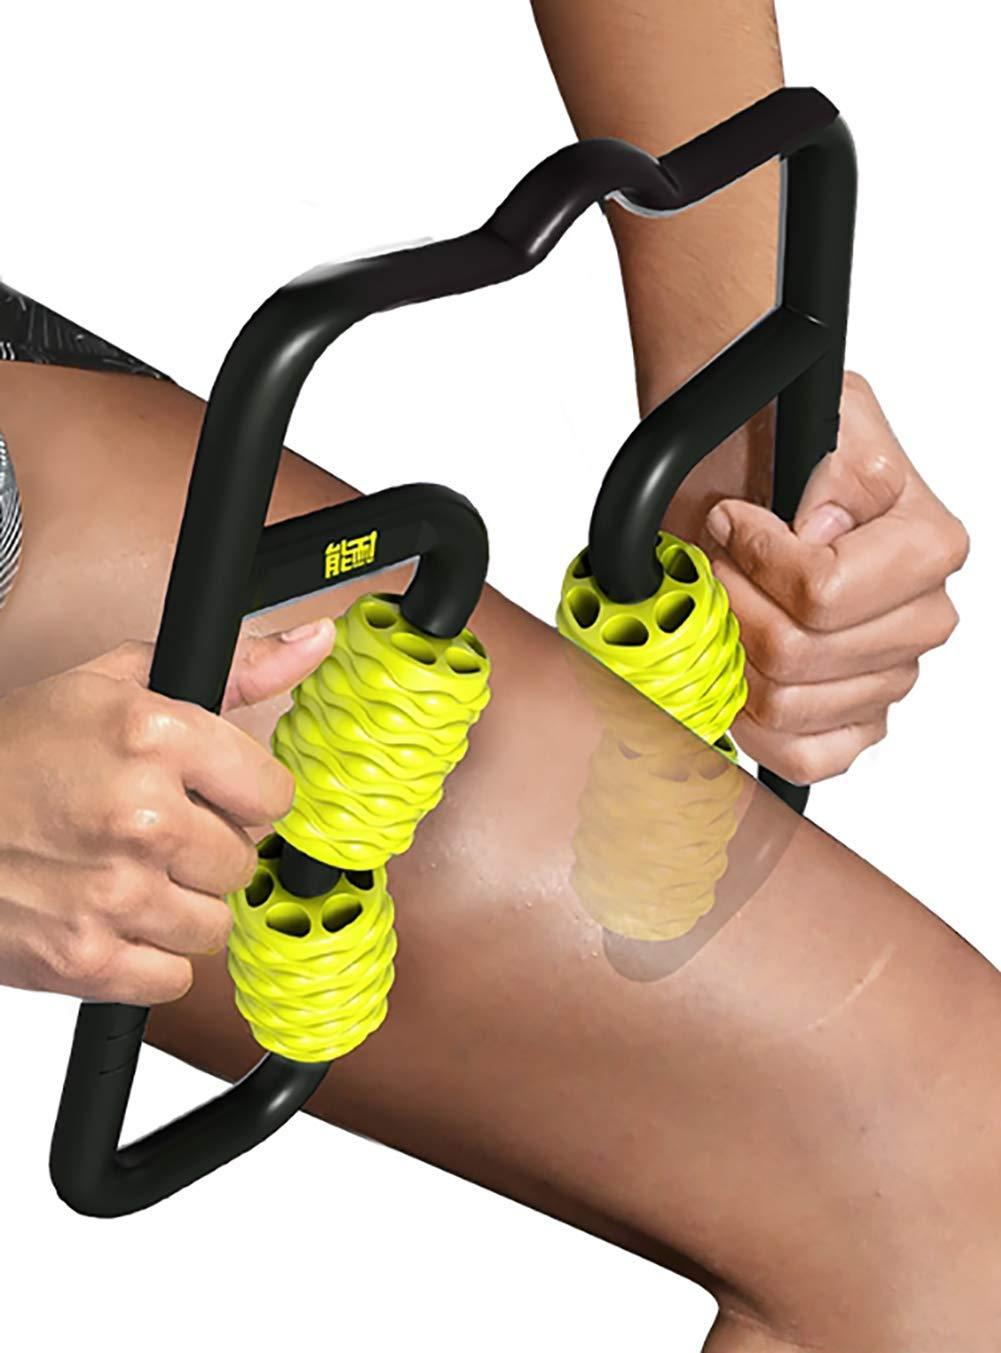 4-Point Foam Roller Massager   Multi-Functional, Pressure Point Massage Tool    2019 Brand-New 4-Point Foam Roller Massager    (Yellow)